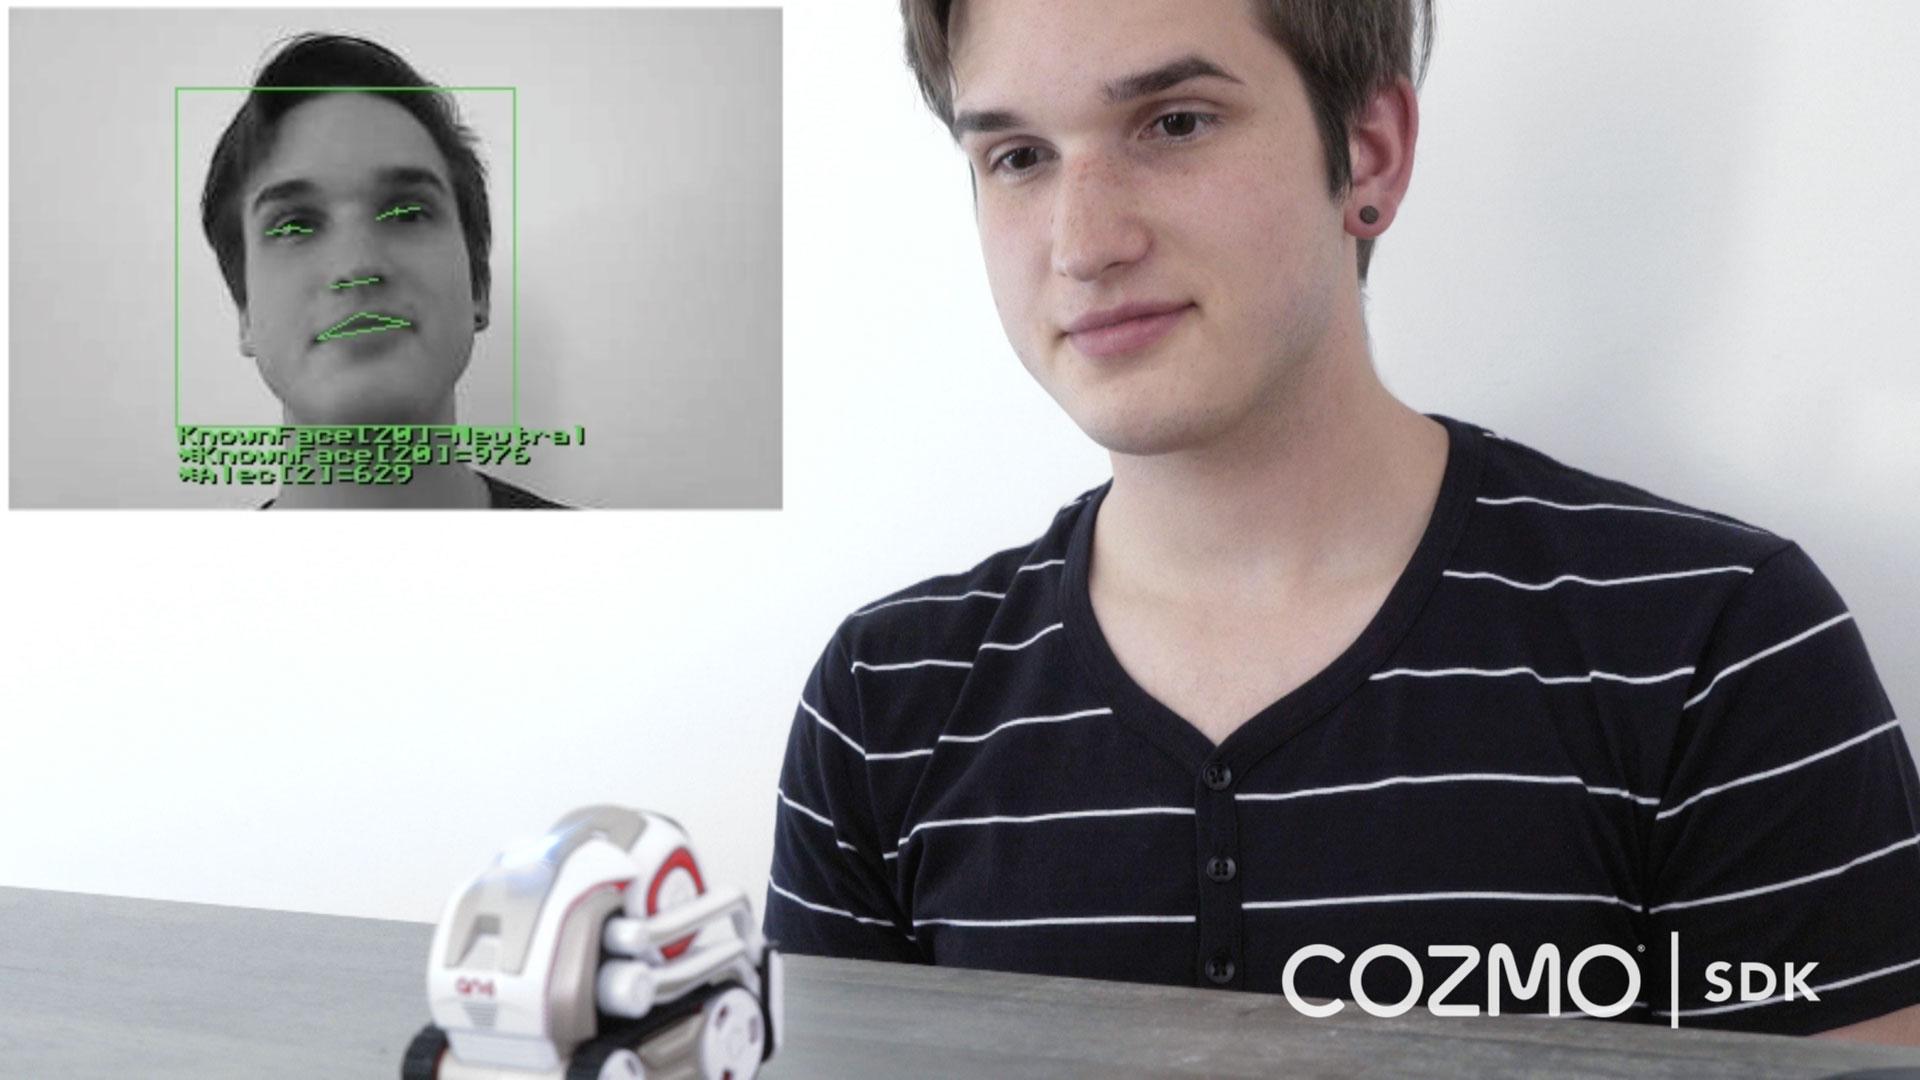 Unique_Cozmo_Facetracking-2